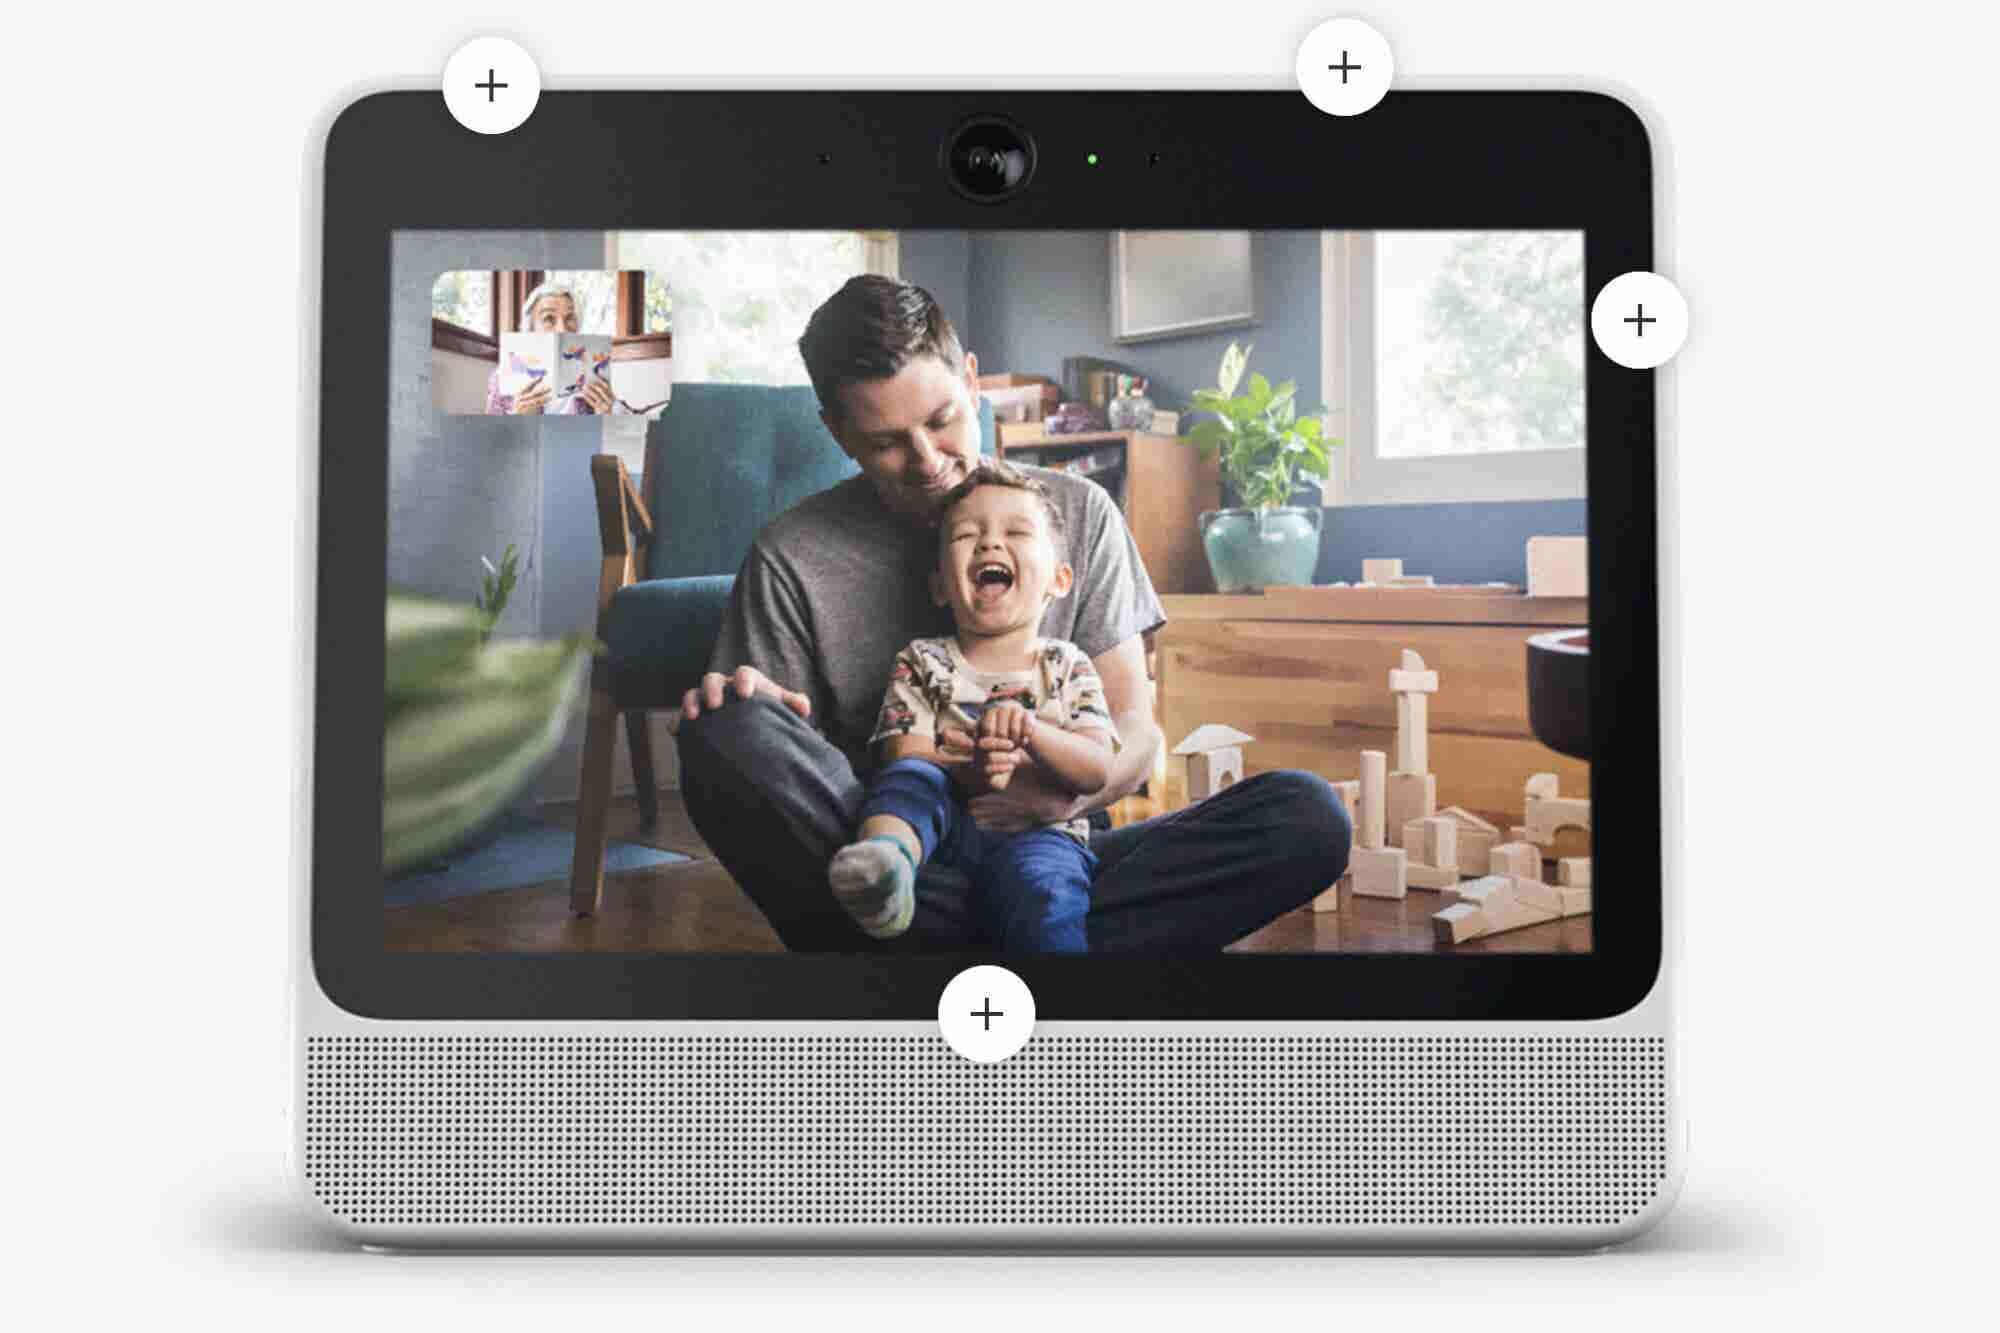 Facebook lanza dispositivo para videollamadas con inteligencia artificial y conectado con Amazon